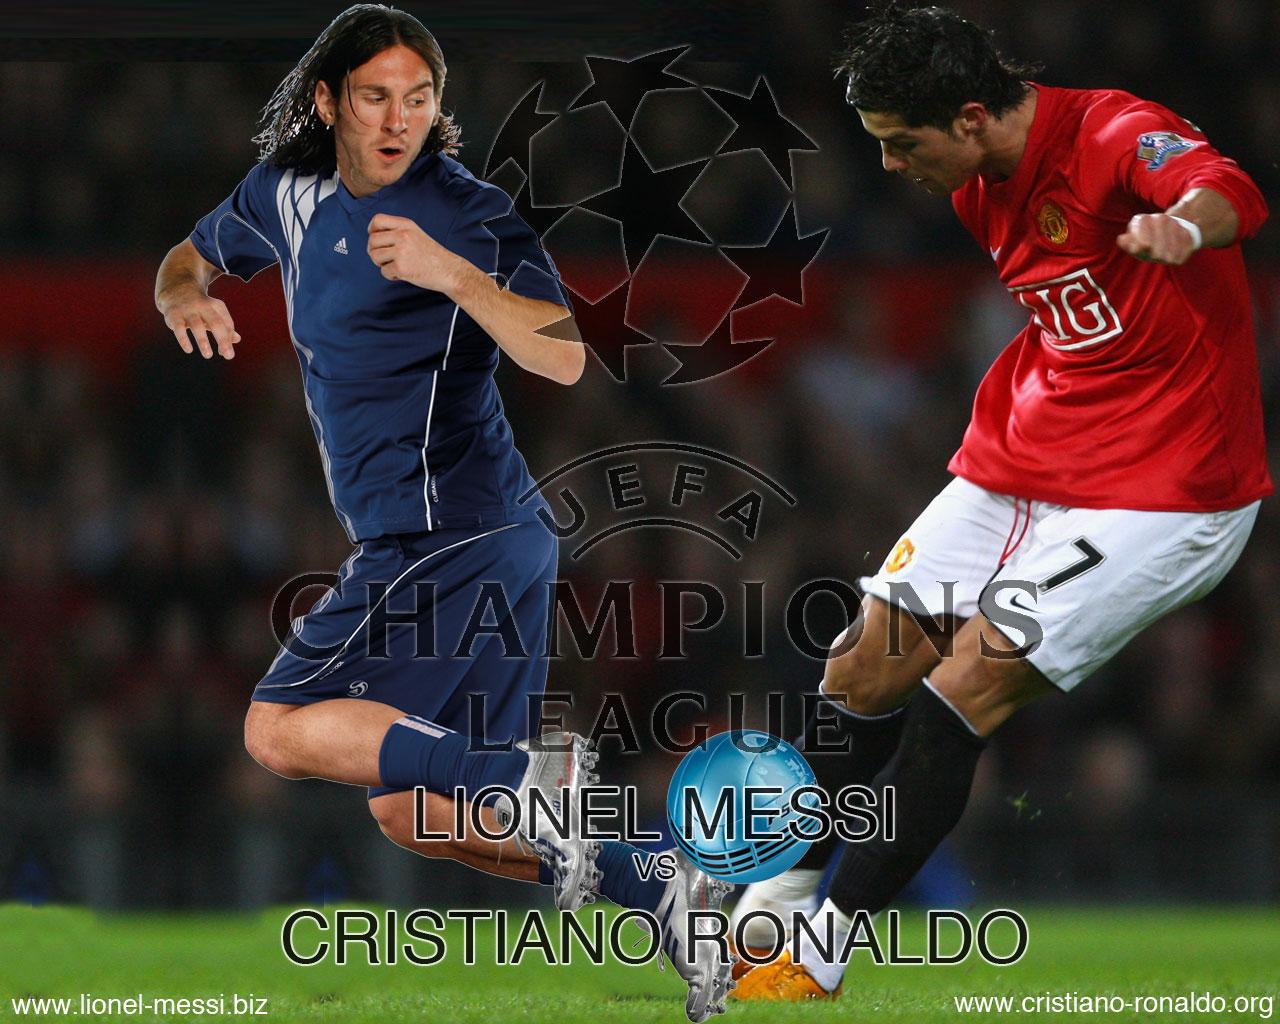 http://2.bp.blogspot.com/__c9qWlUD8Qs/S9Lj8Nv9MpI/AAAAAAAAI0k/qVVFD8_6wT0/s1600/cristiano-ronaldo-vs-lionel-messi-192.jpg